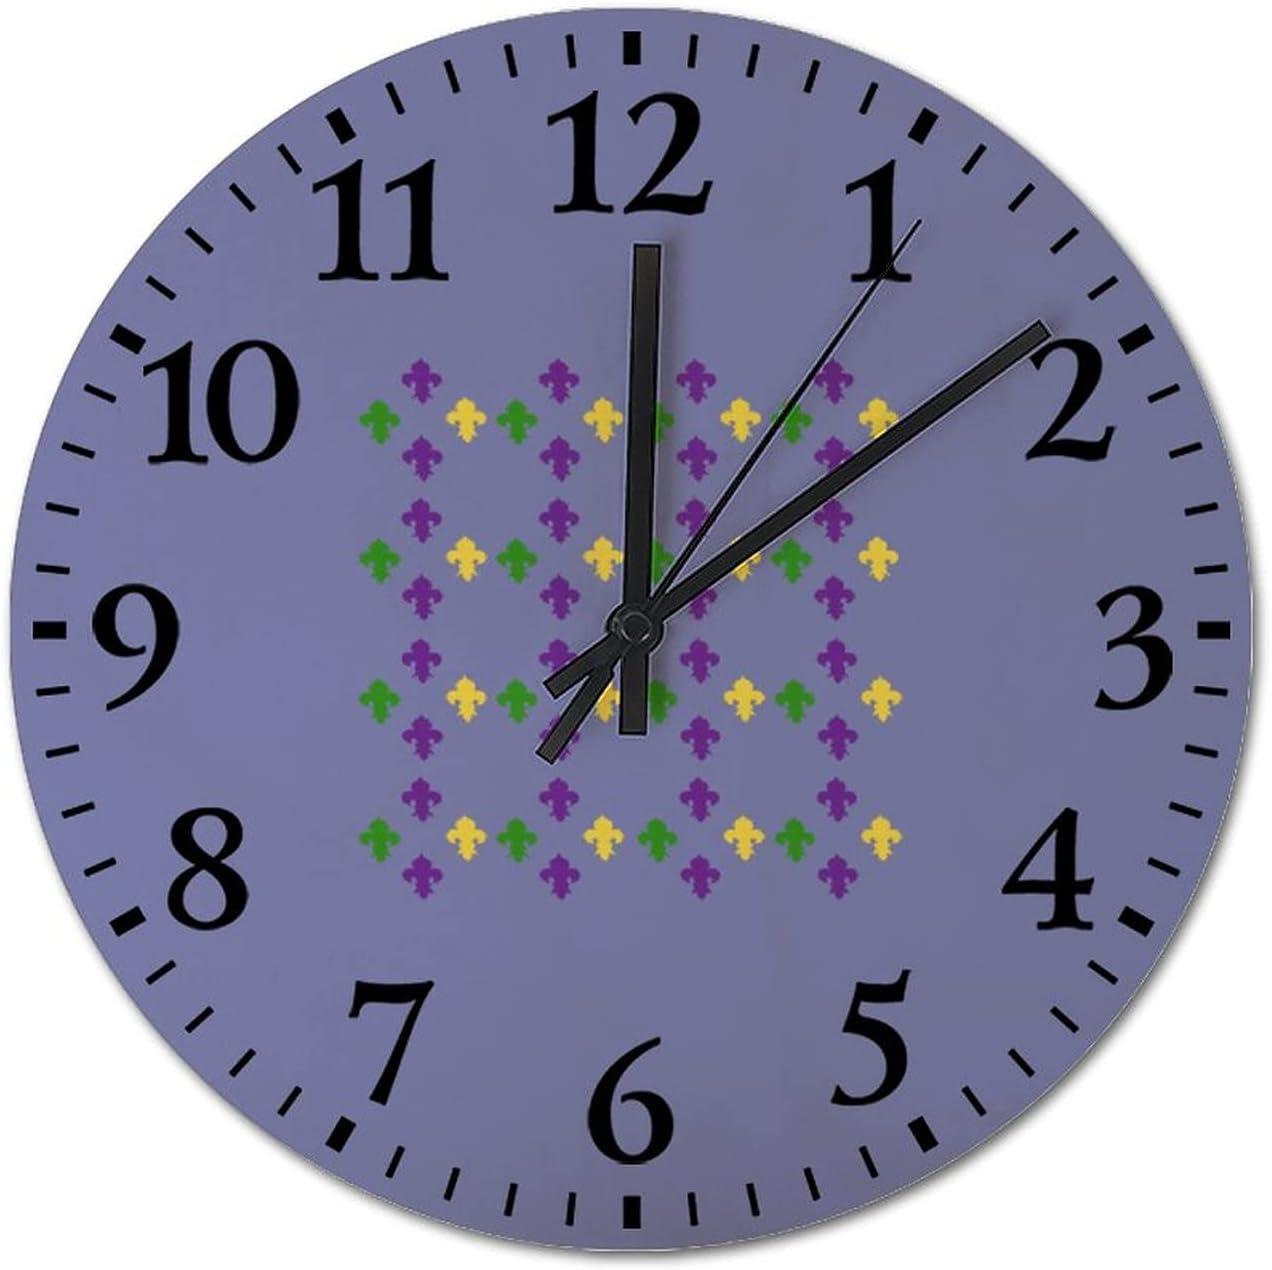 Mardi Fashionable Gras Fleur De Popular product Lis Round Clock Fashion Wood Living for Wall